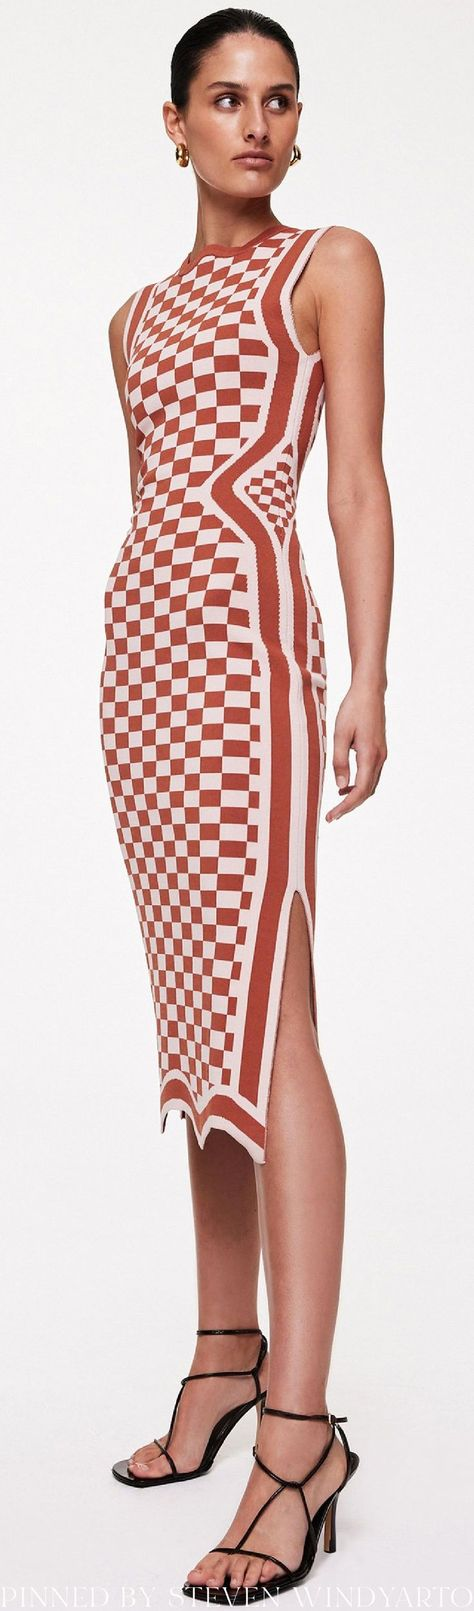 Rachel Gilbert Spring 2022 Lookbook - Anders Crepe Midi Dress #spring2022 #ss22 #womenswear #rachelgilbert